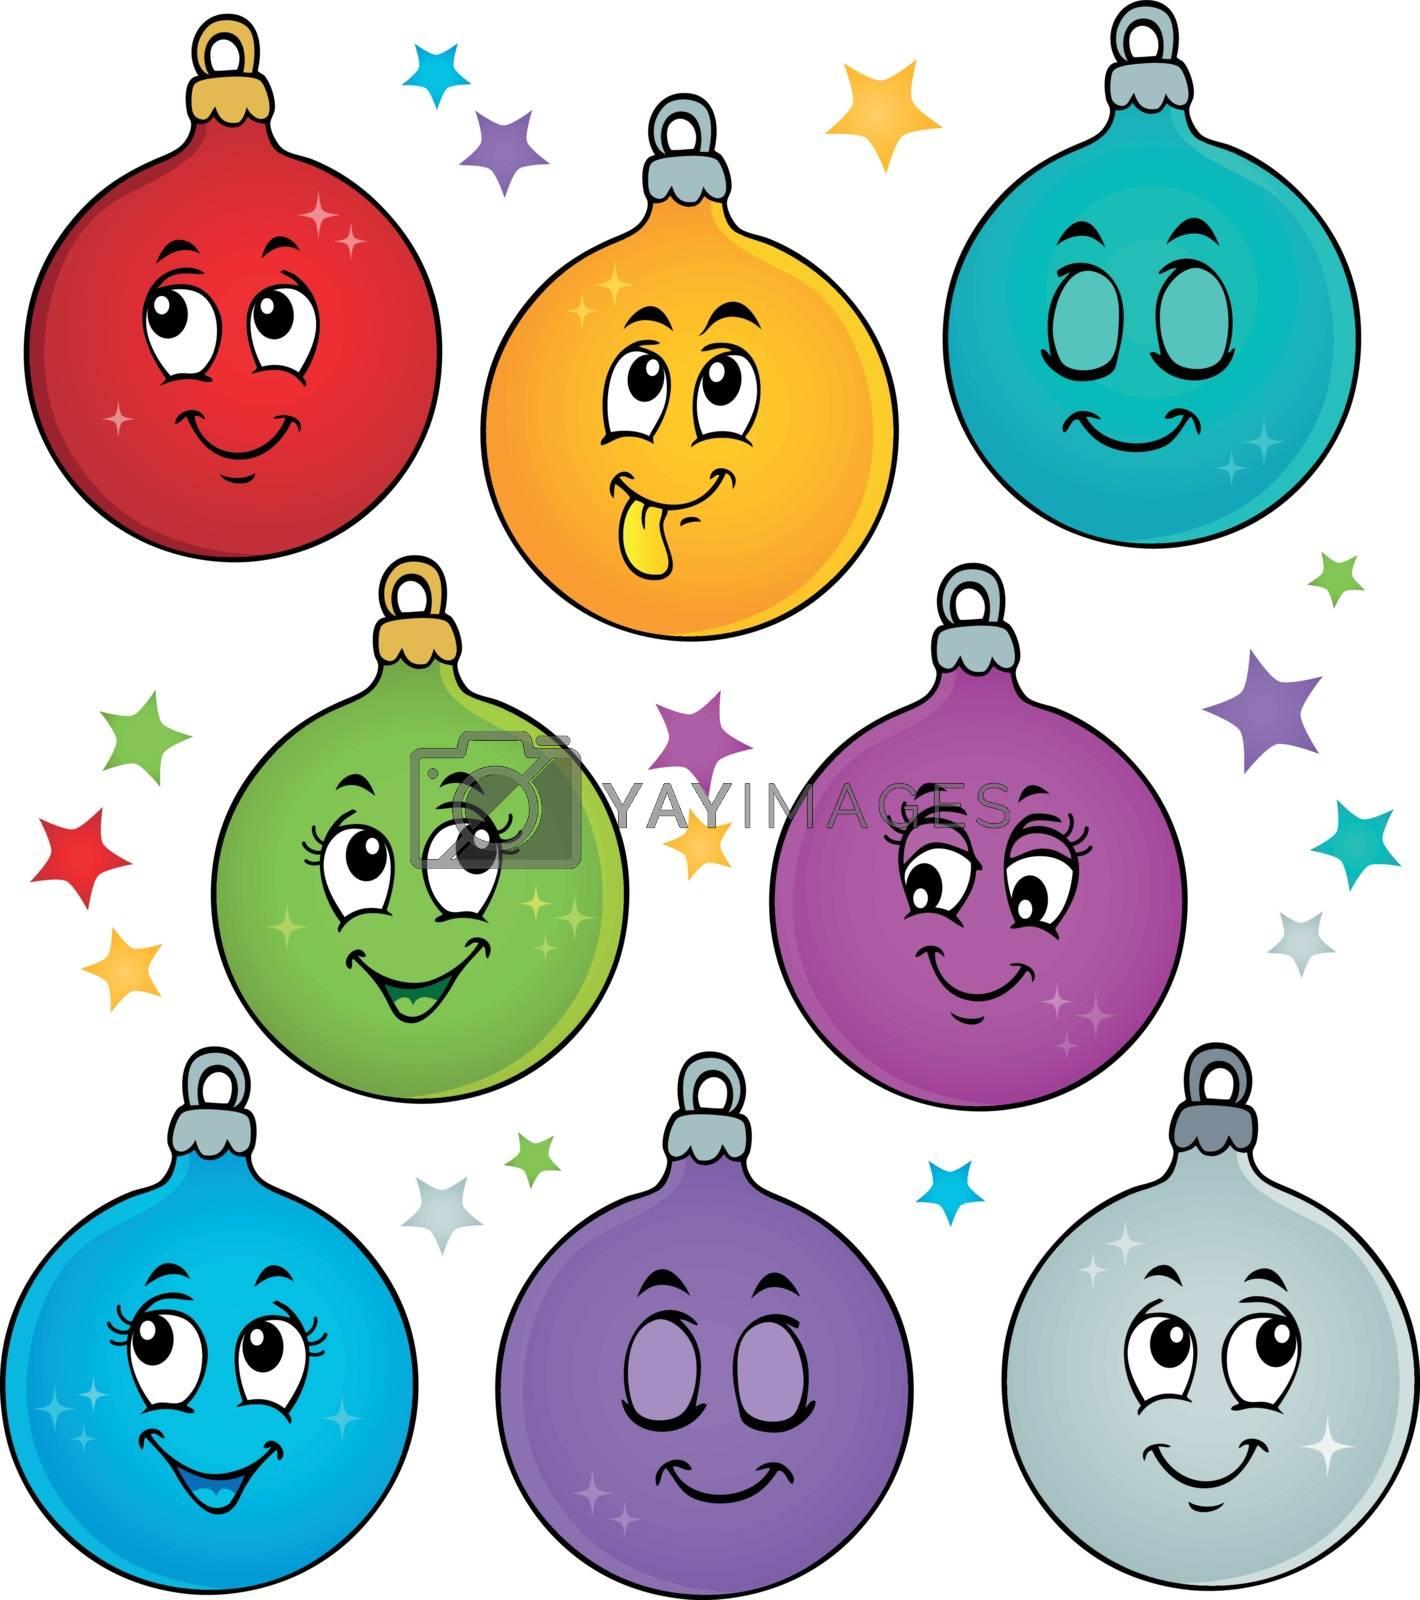 Happy Christmas ornaments theme image 1 - eps10 vector illustration.